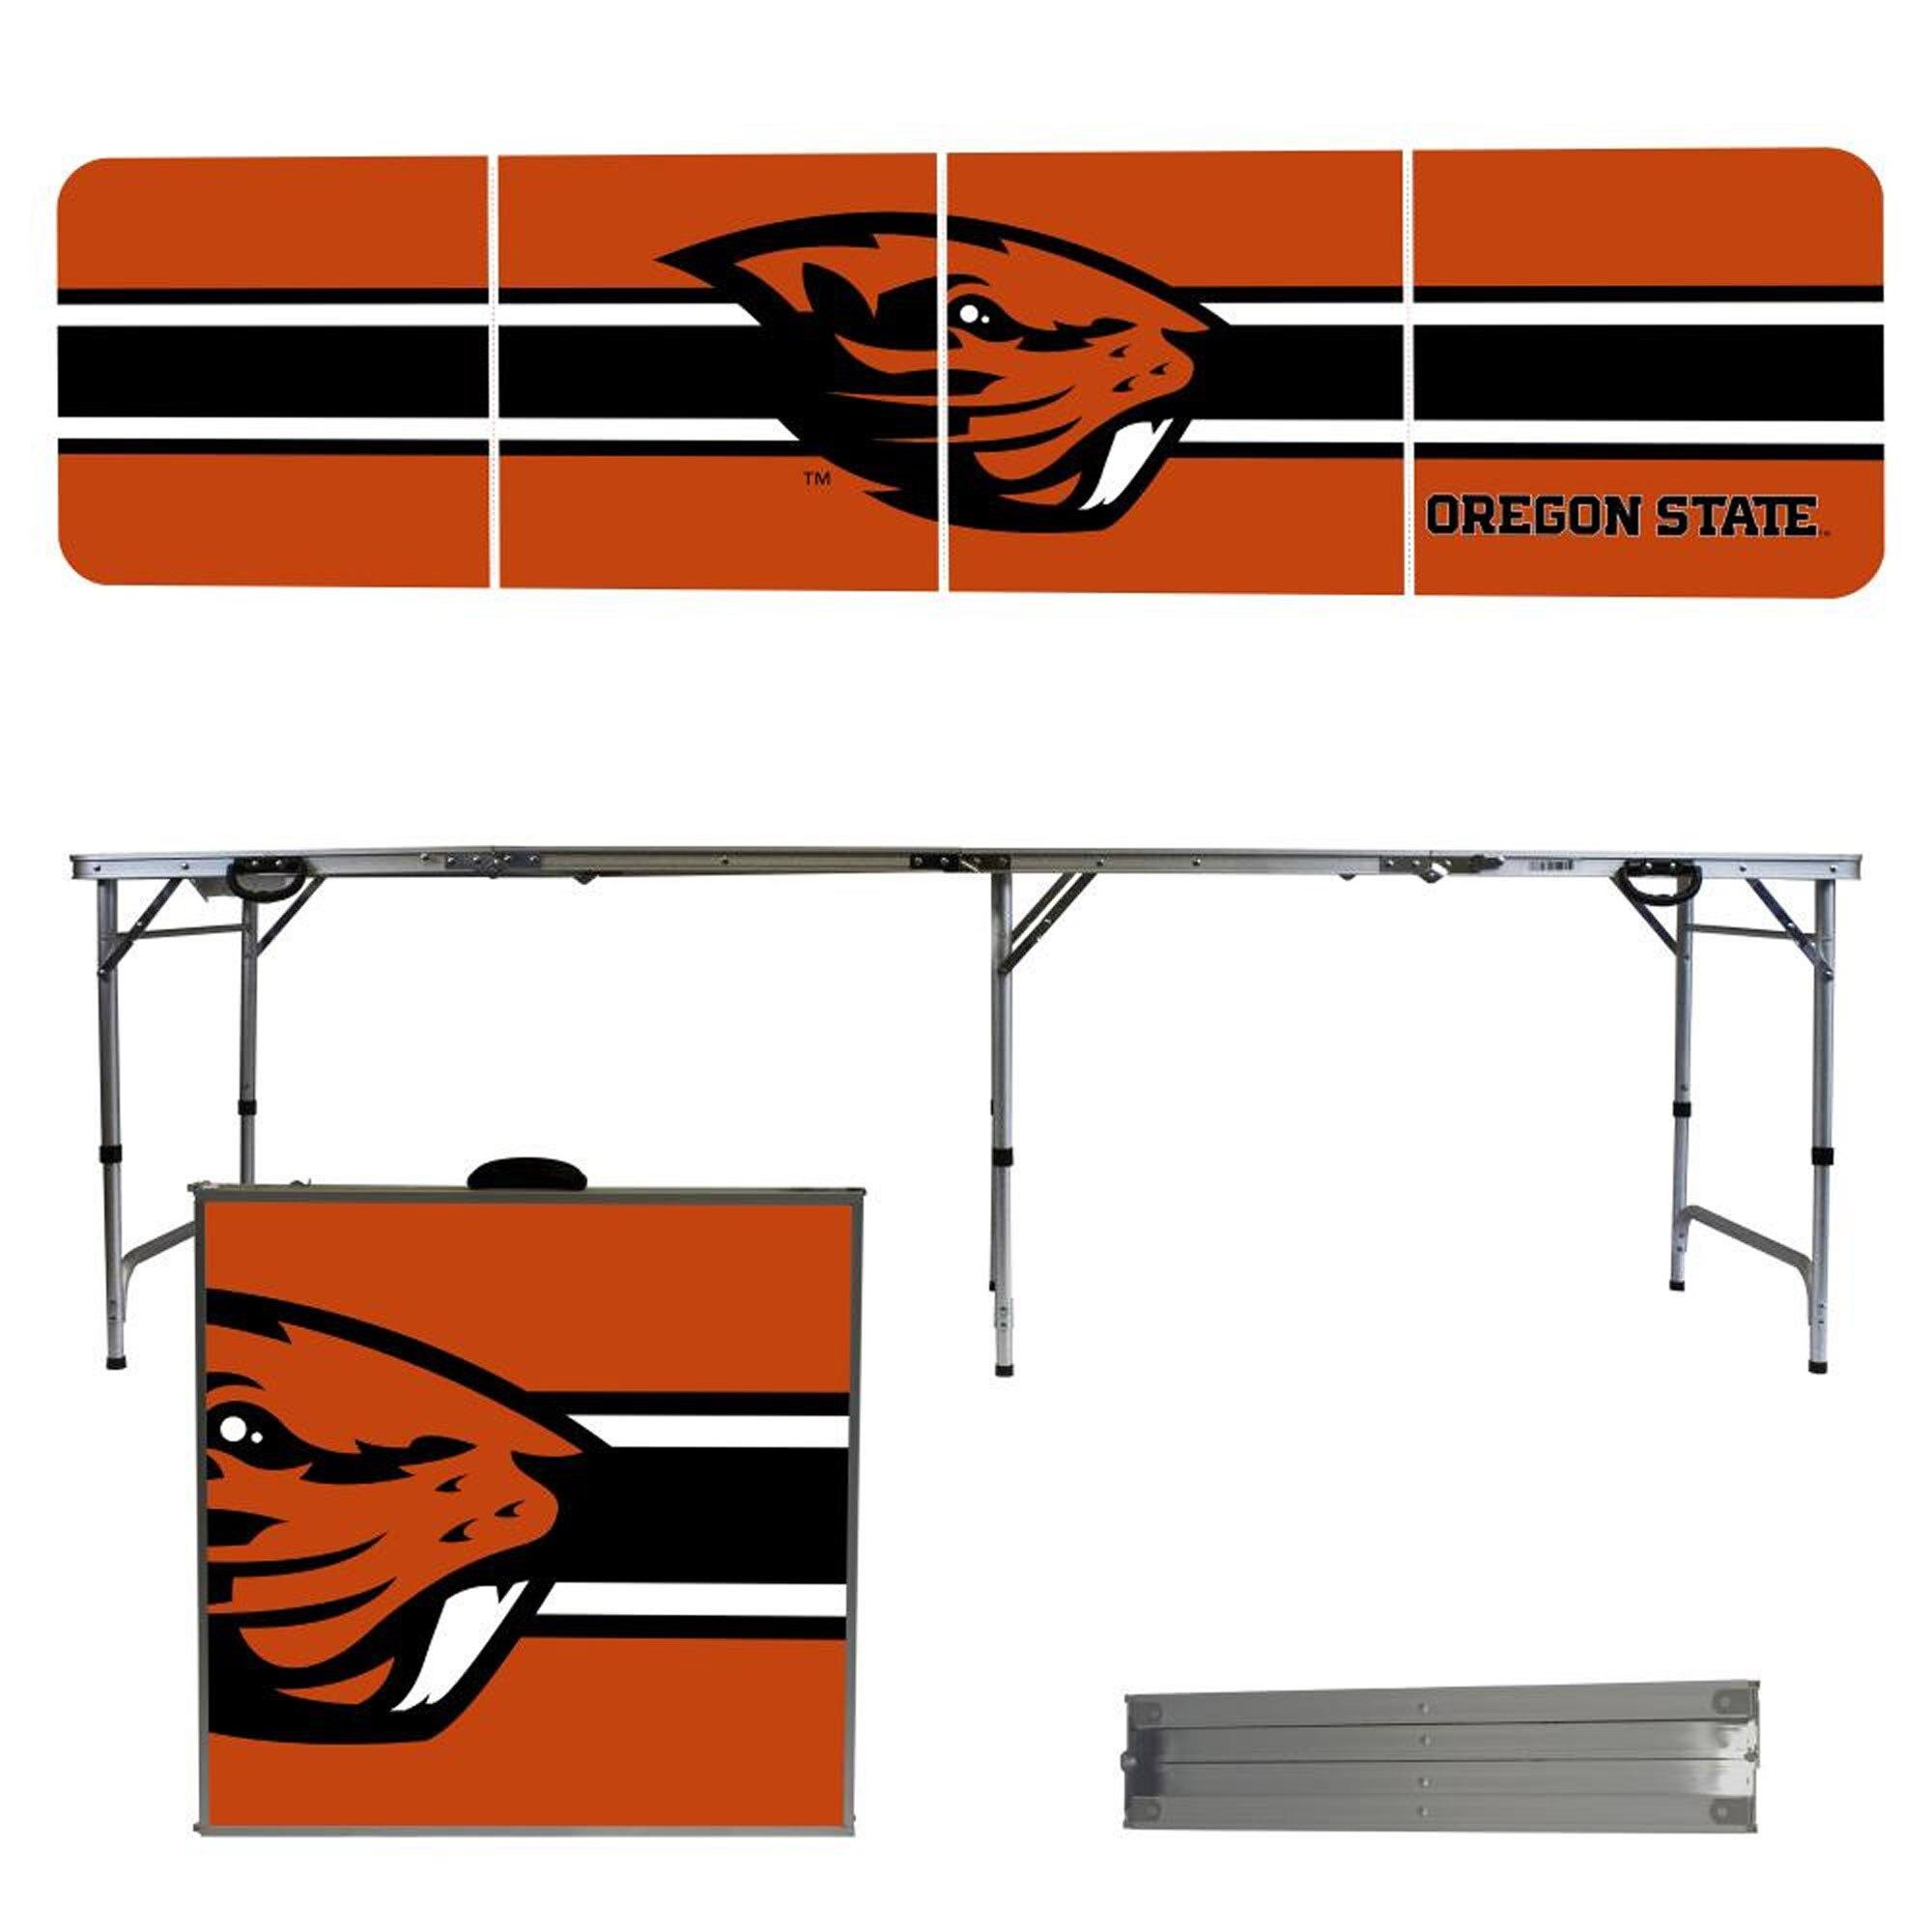 Oregon State Beavers Striped Design 8' Portable Folding Tailgate Table